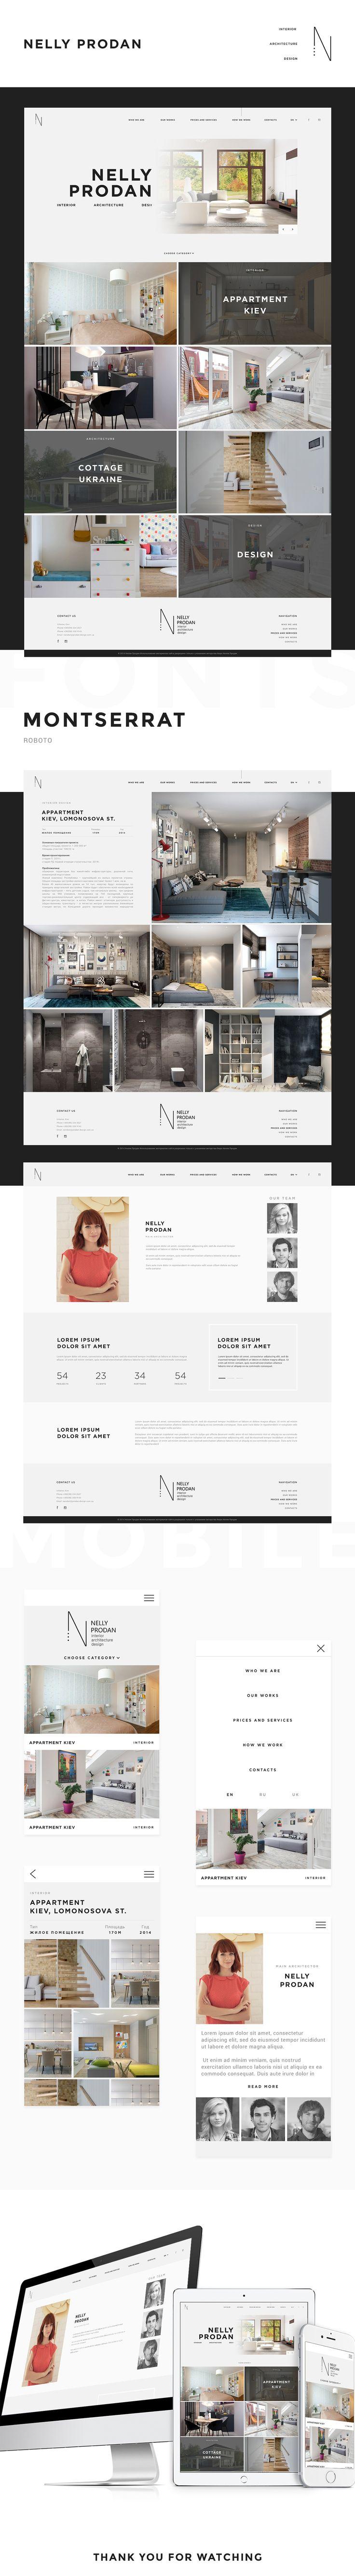 Architect / Design studio on Behance